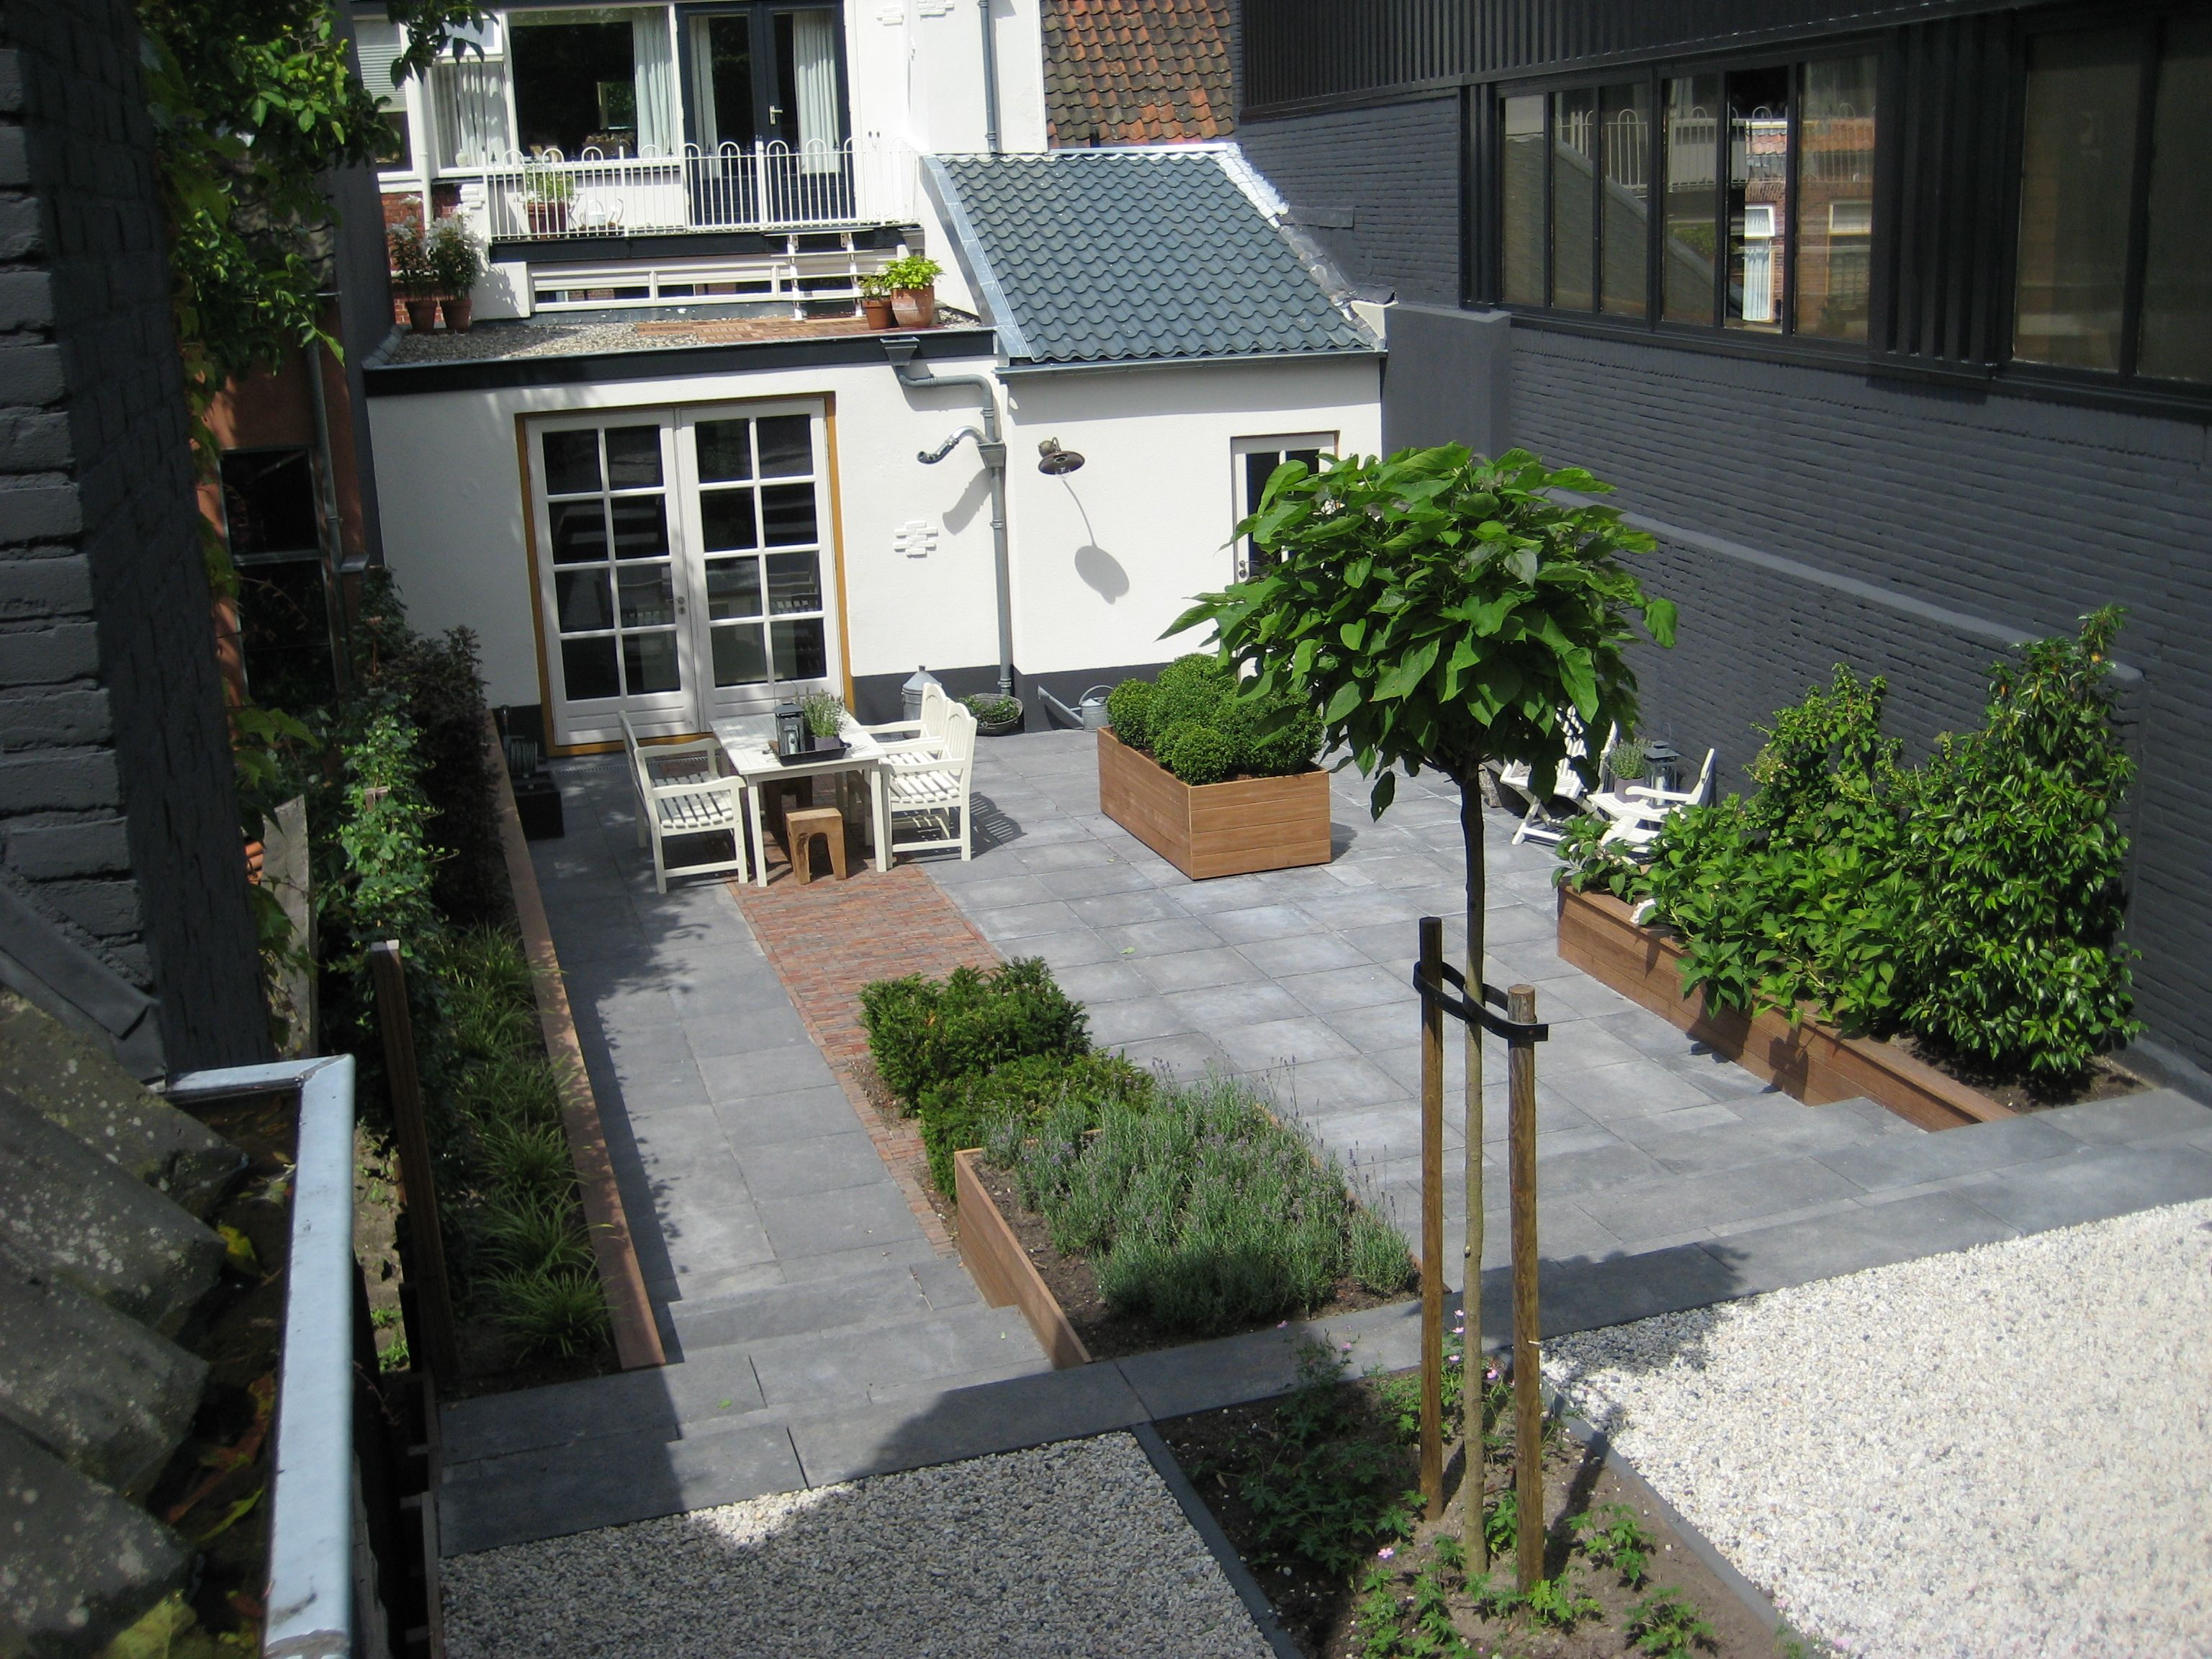 achtertuin tuin backyard garden small city urban dutch